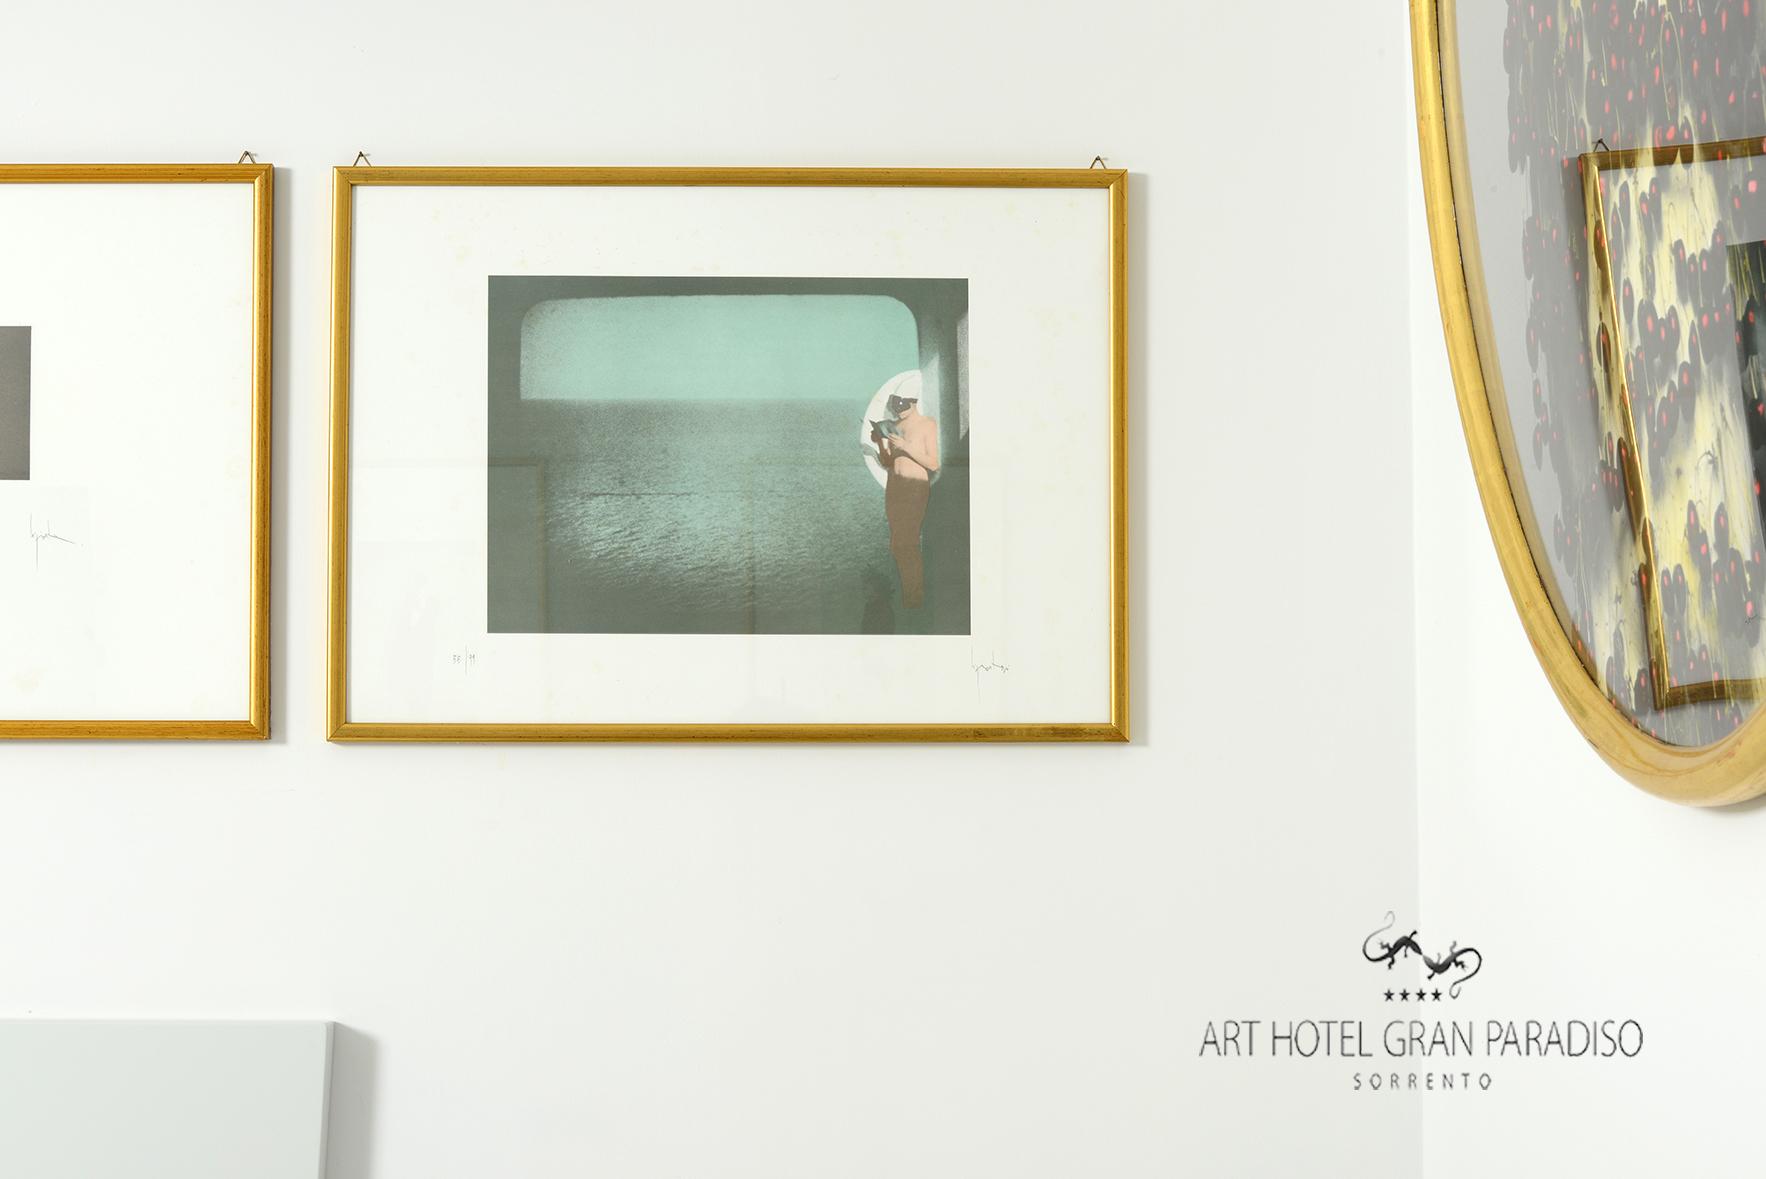 Art_Hotel_Gran_Paradiso_2013_411_Luigi_Ontani_9.jpg